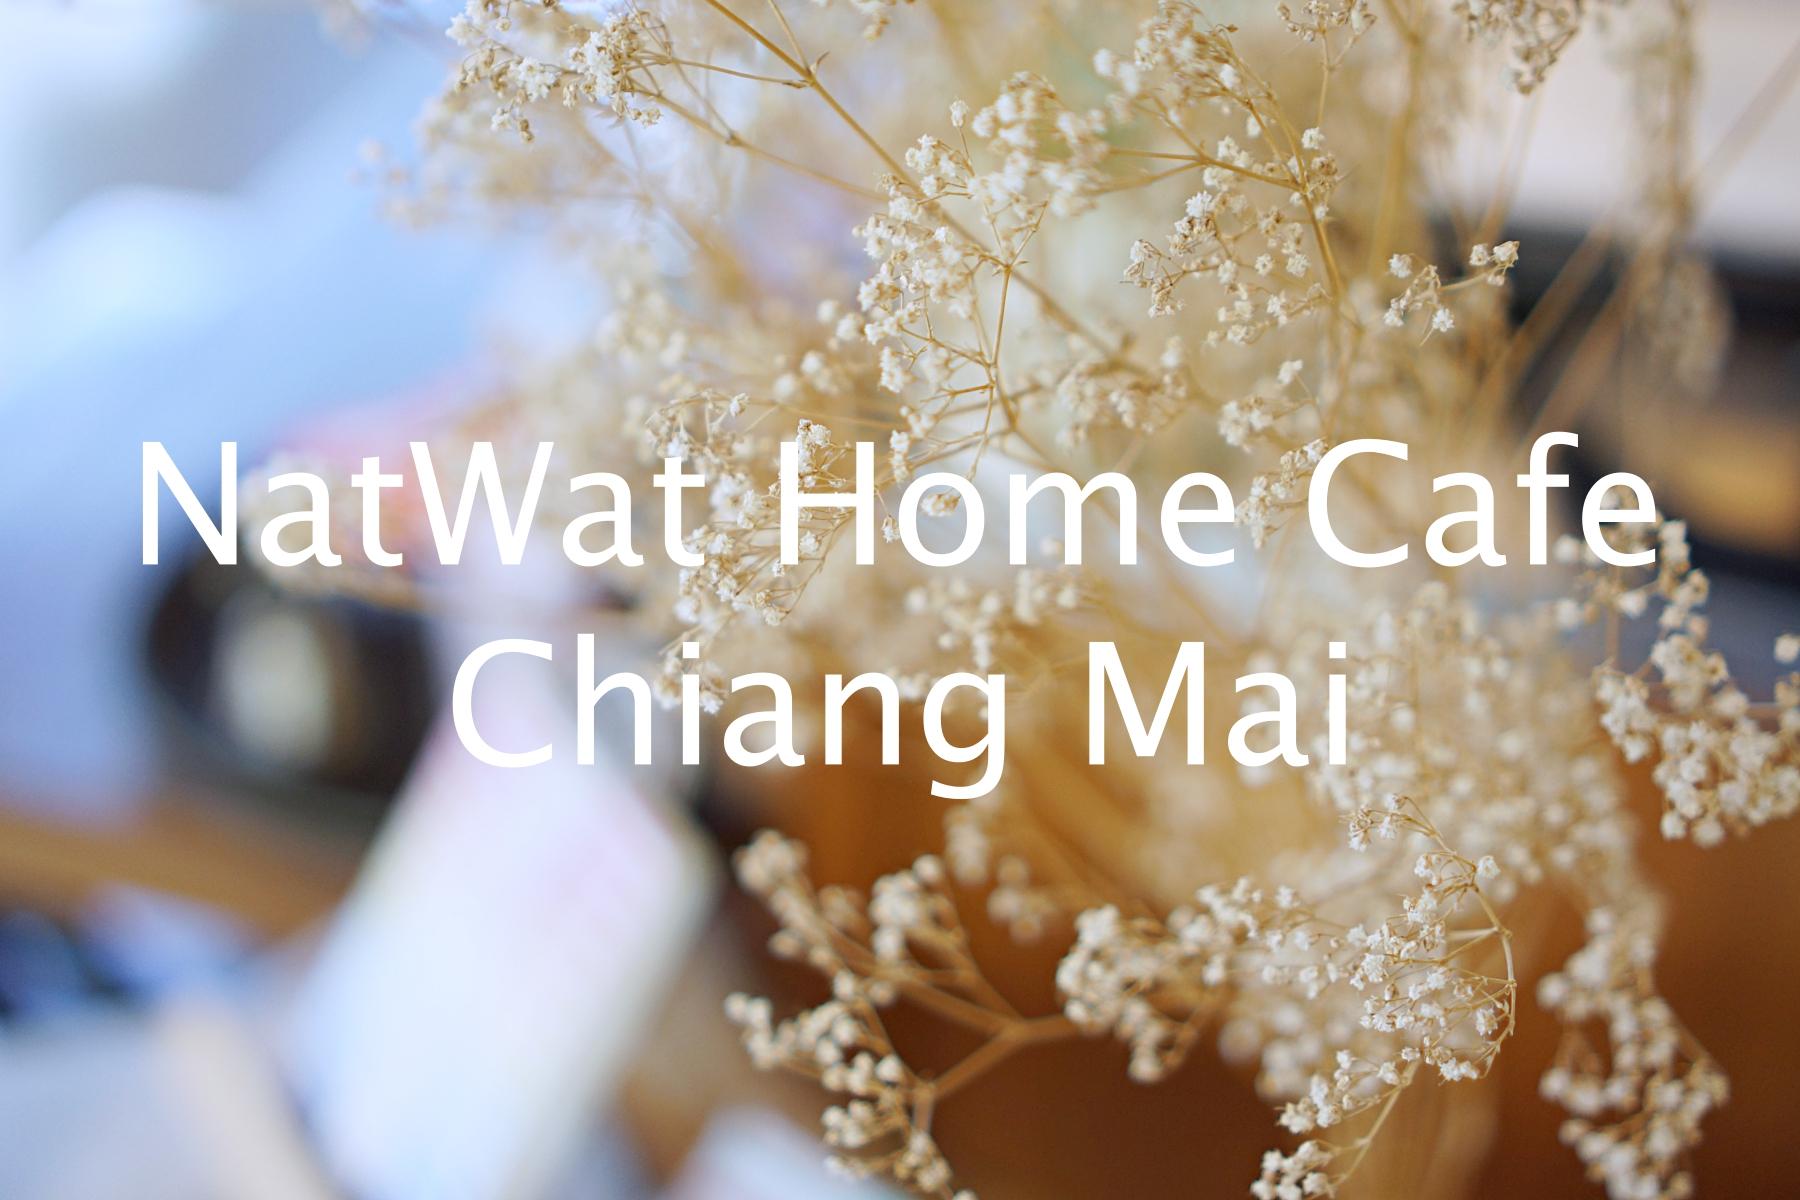 NatWat Home Cafe Chiang Mai